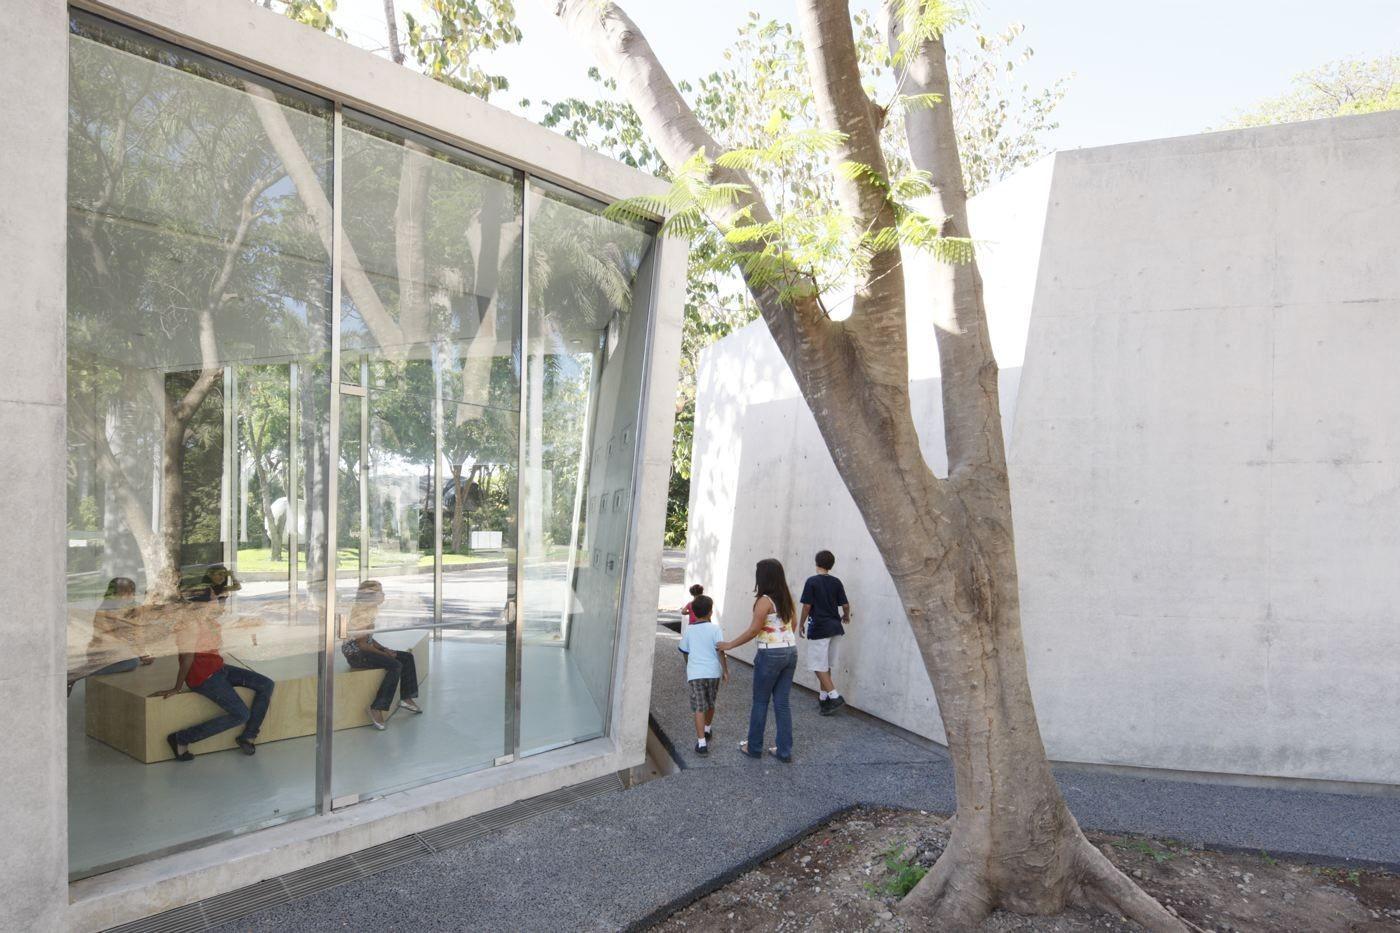 Arquitecta mexicana gana Premio Global de Arquitectura Sostenible, Jardín Botánico, obra de Tatiana Bilbao. Image © Iwan Baan